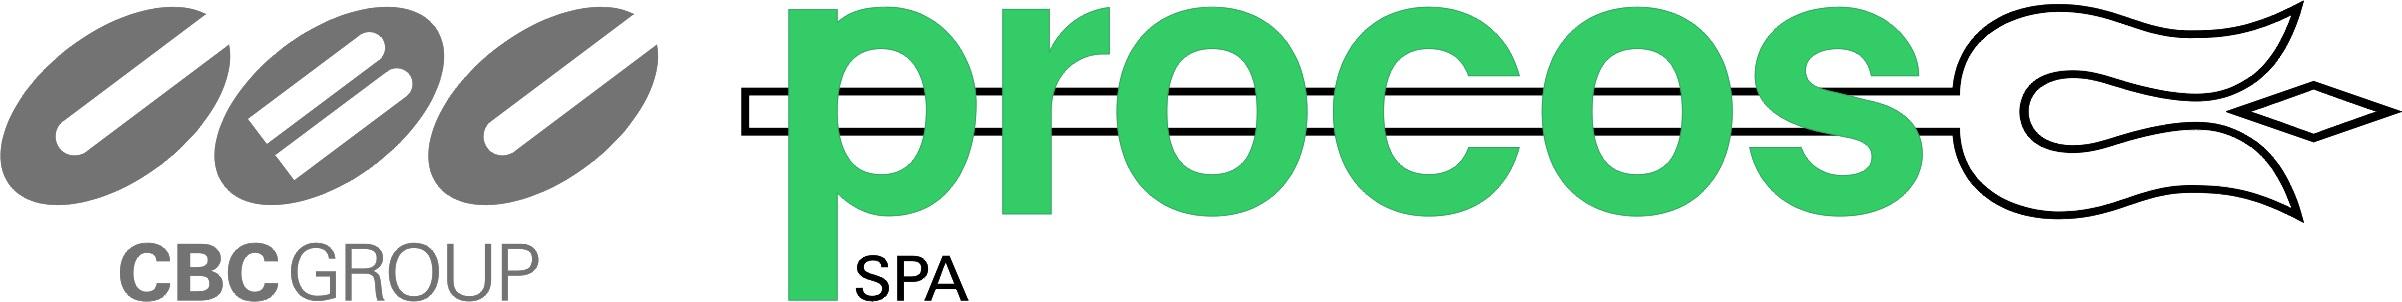 CBC-PROCOS_logo